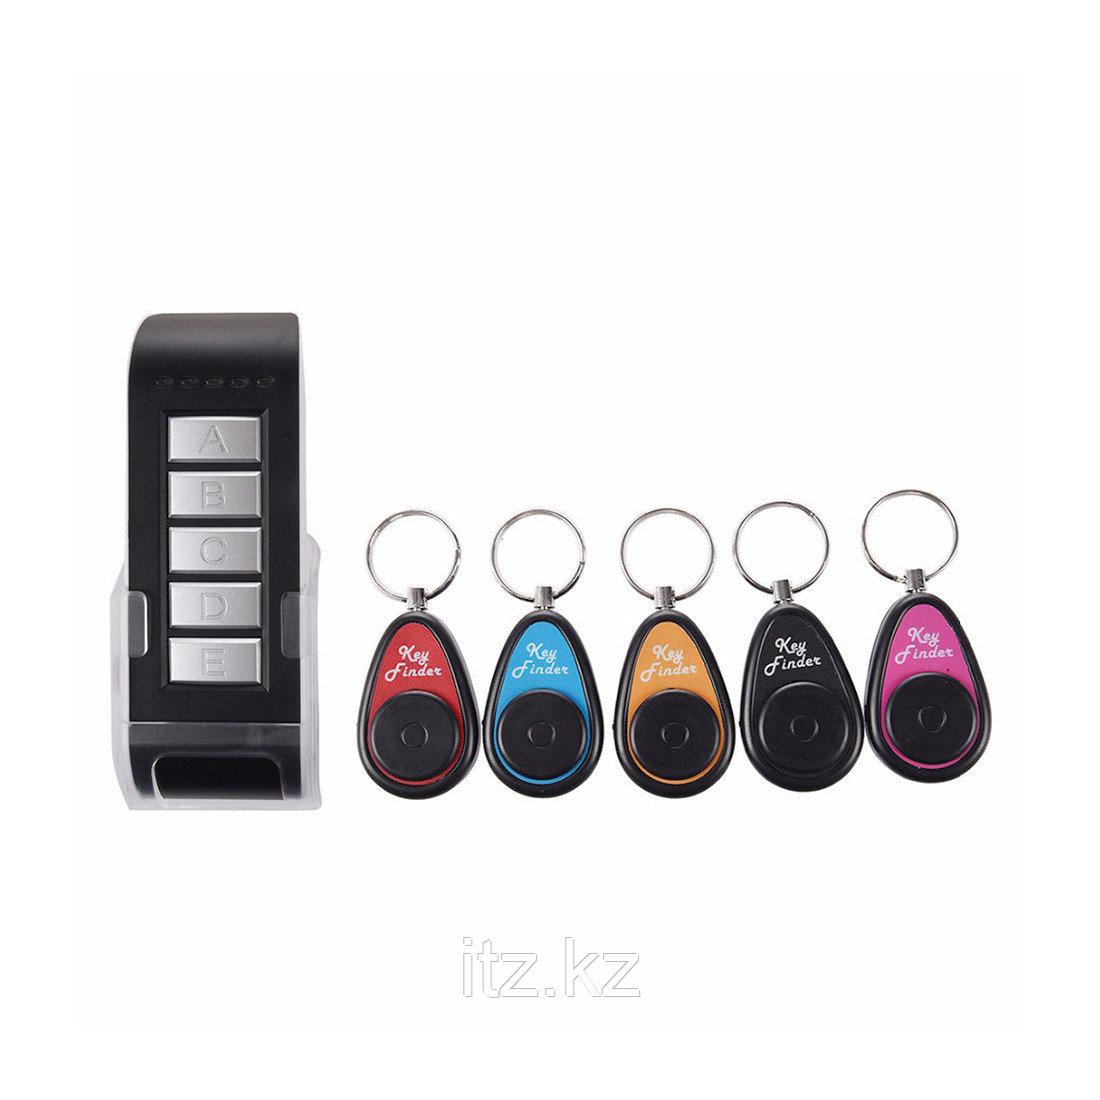 Брелок для поиска ключей bluetooth key finder for iPhone4S/iPhone5/new iPad